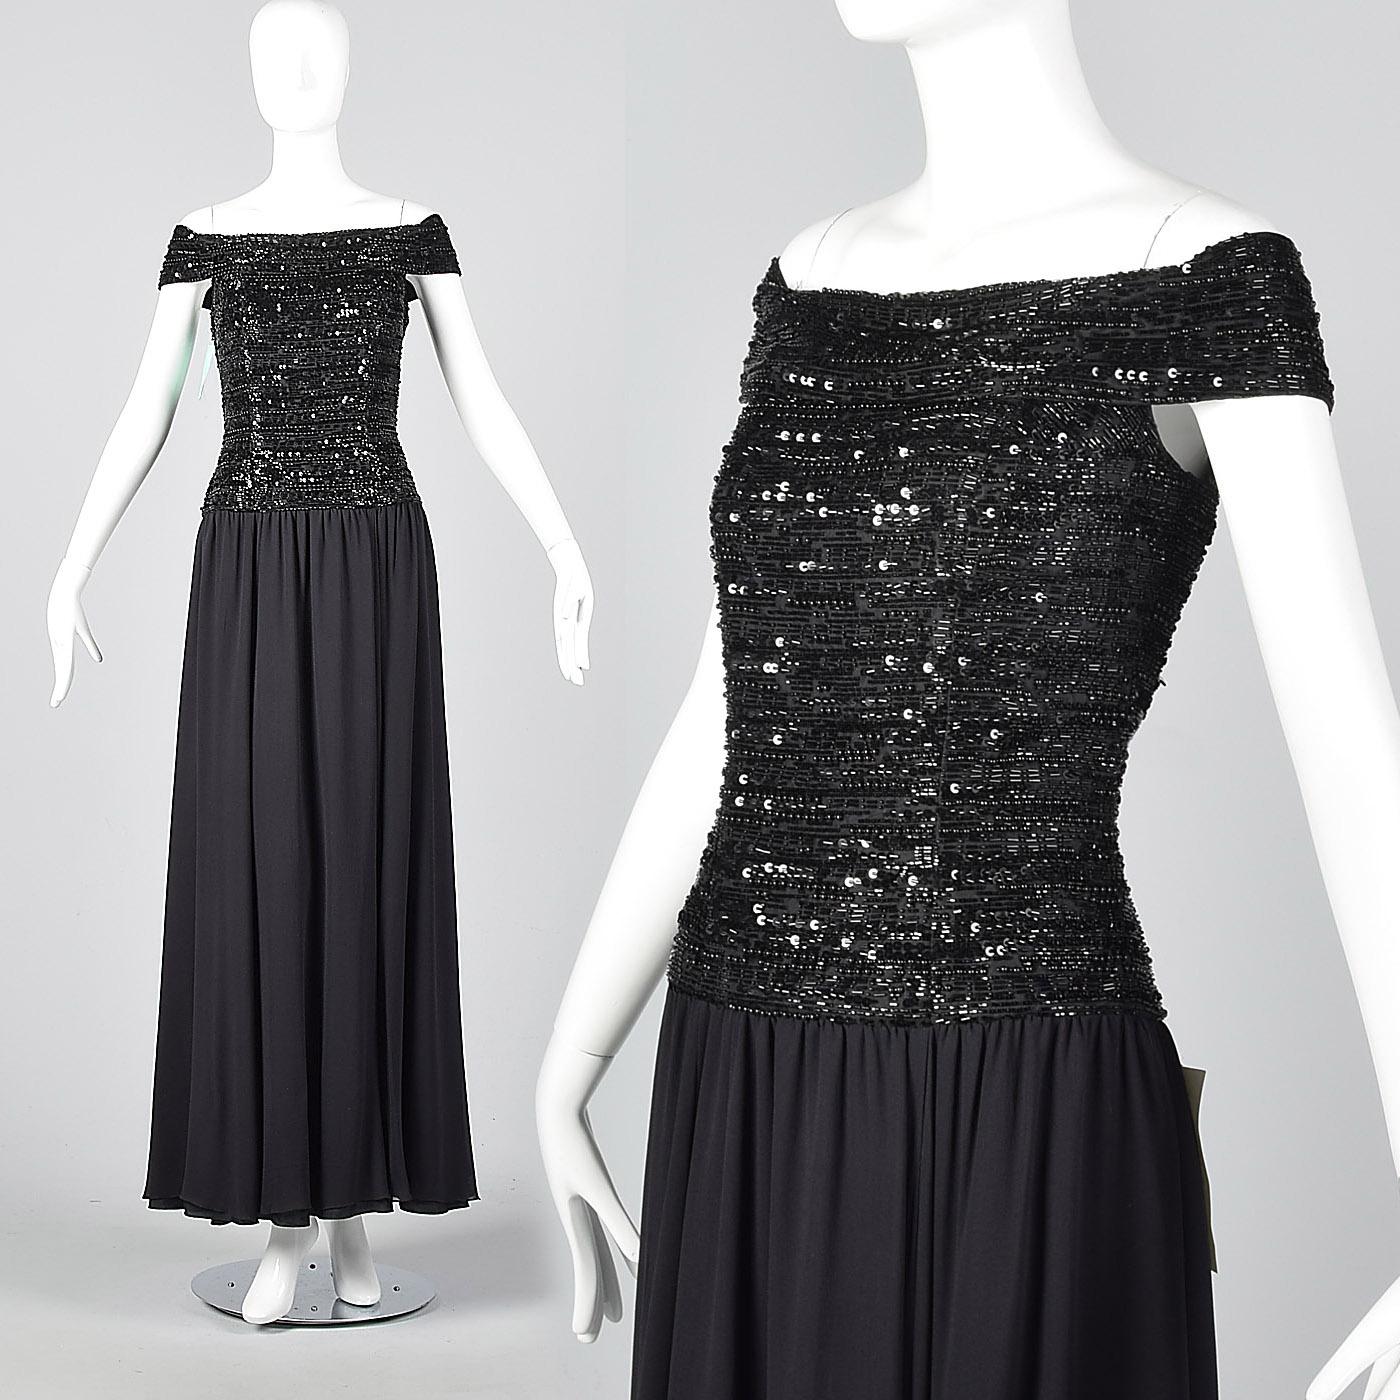 Oleg Cassini Black Tie Summer Evening Dress Elegant Formal Gown ...